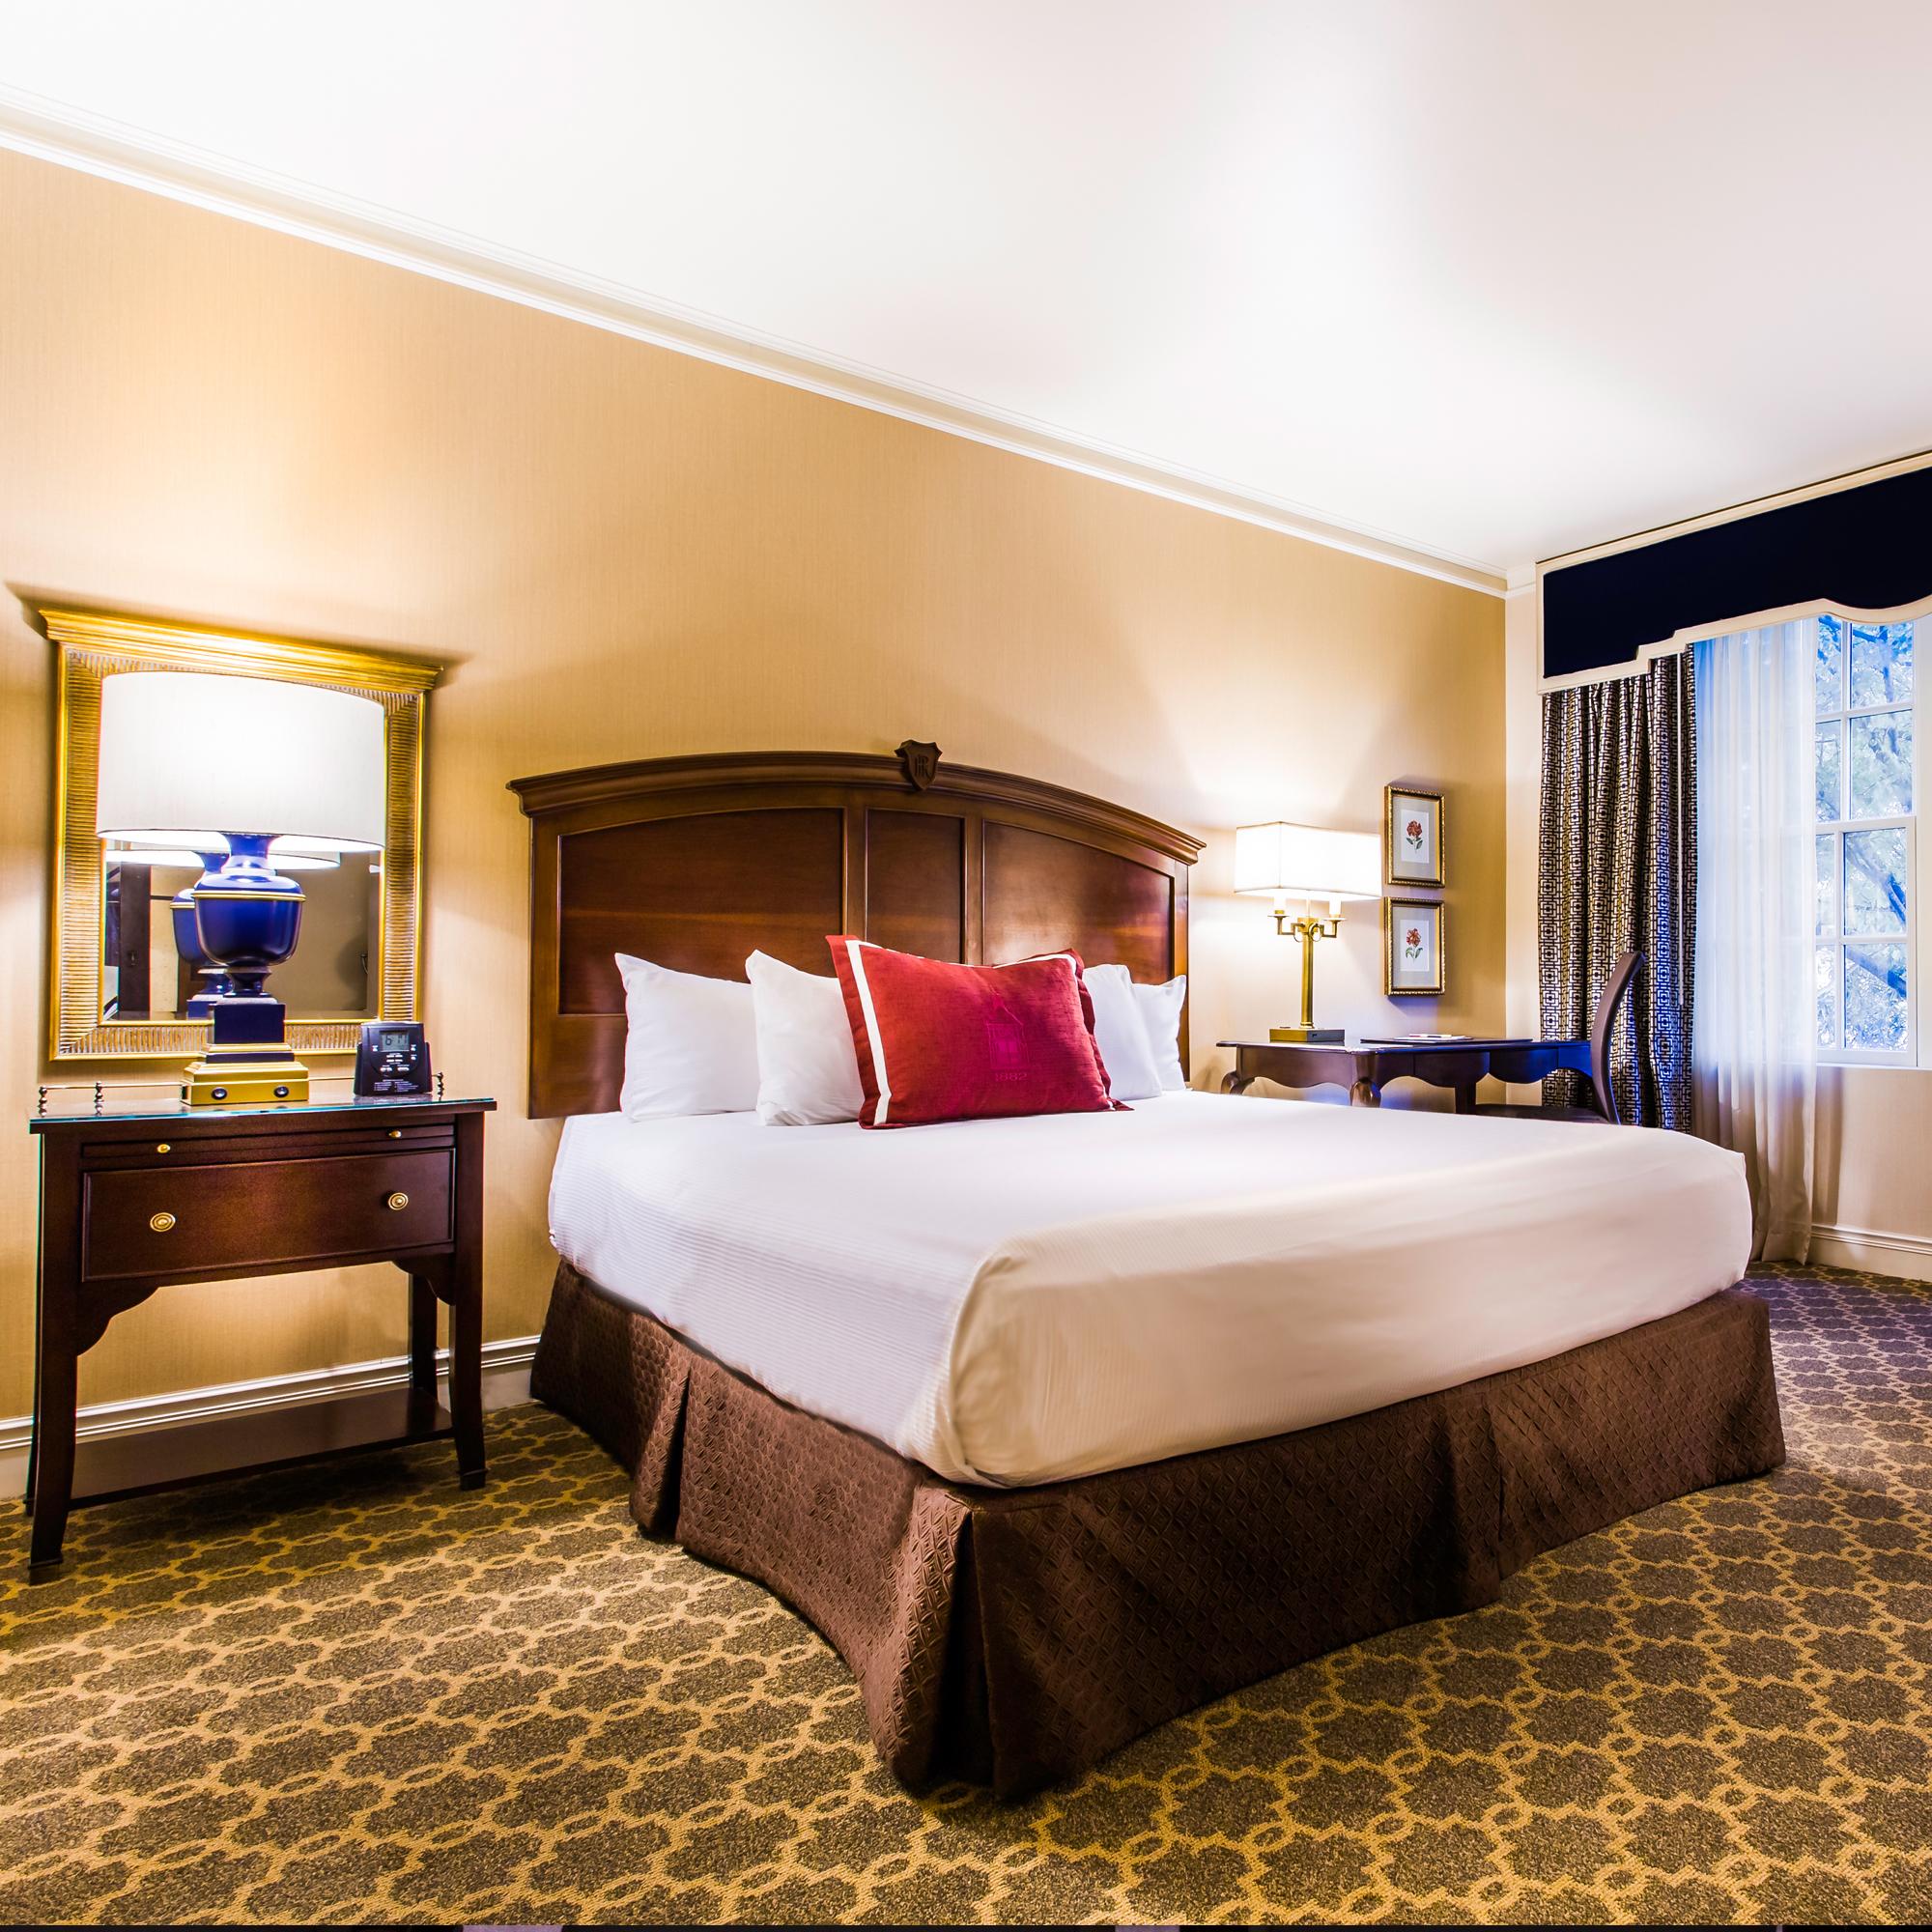 Virginia S Hotel Roanoke Conference Center Joins Benchmark Resorts Hotels Portfolio